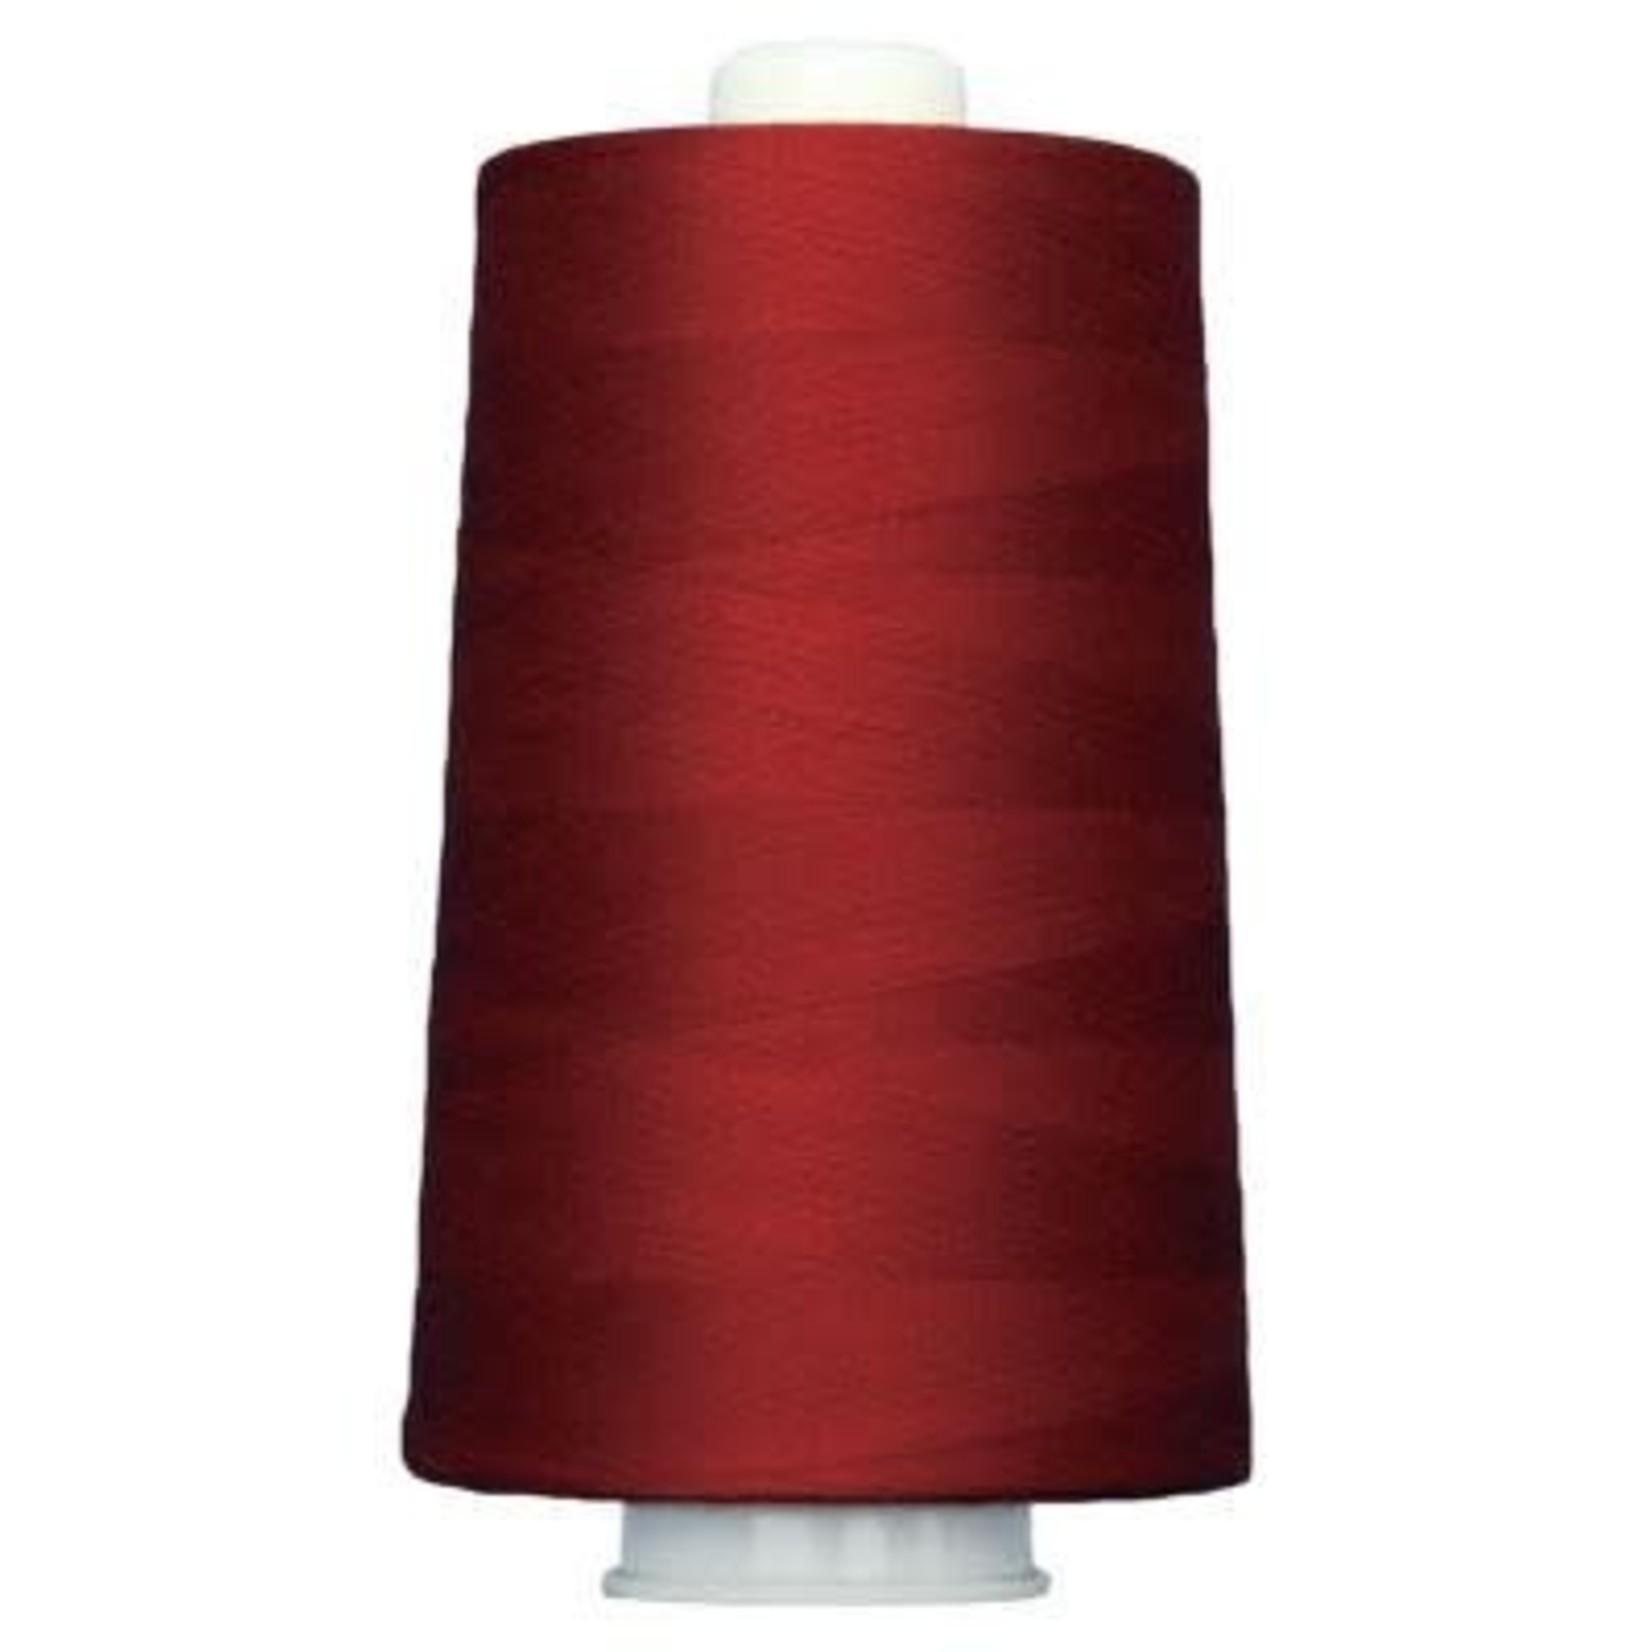 Superior Threads Omni 3140 Fiery Red 6000 Yards